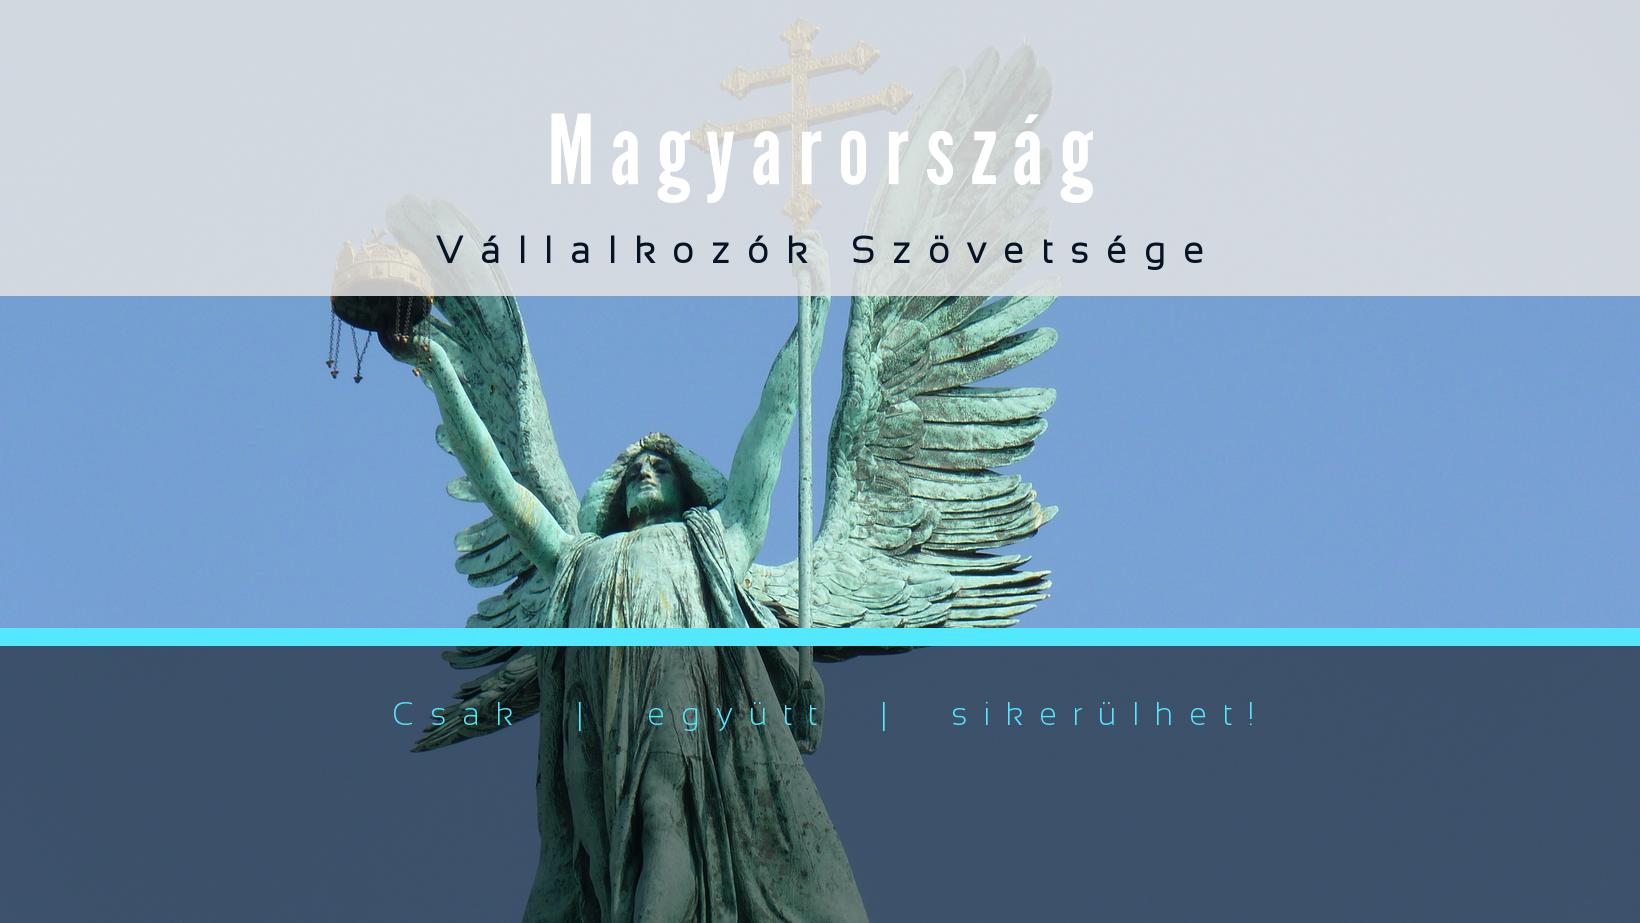 vsz_magyarorszag_fb_cover_vegleges.png